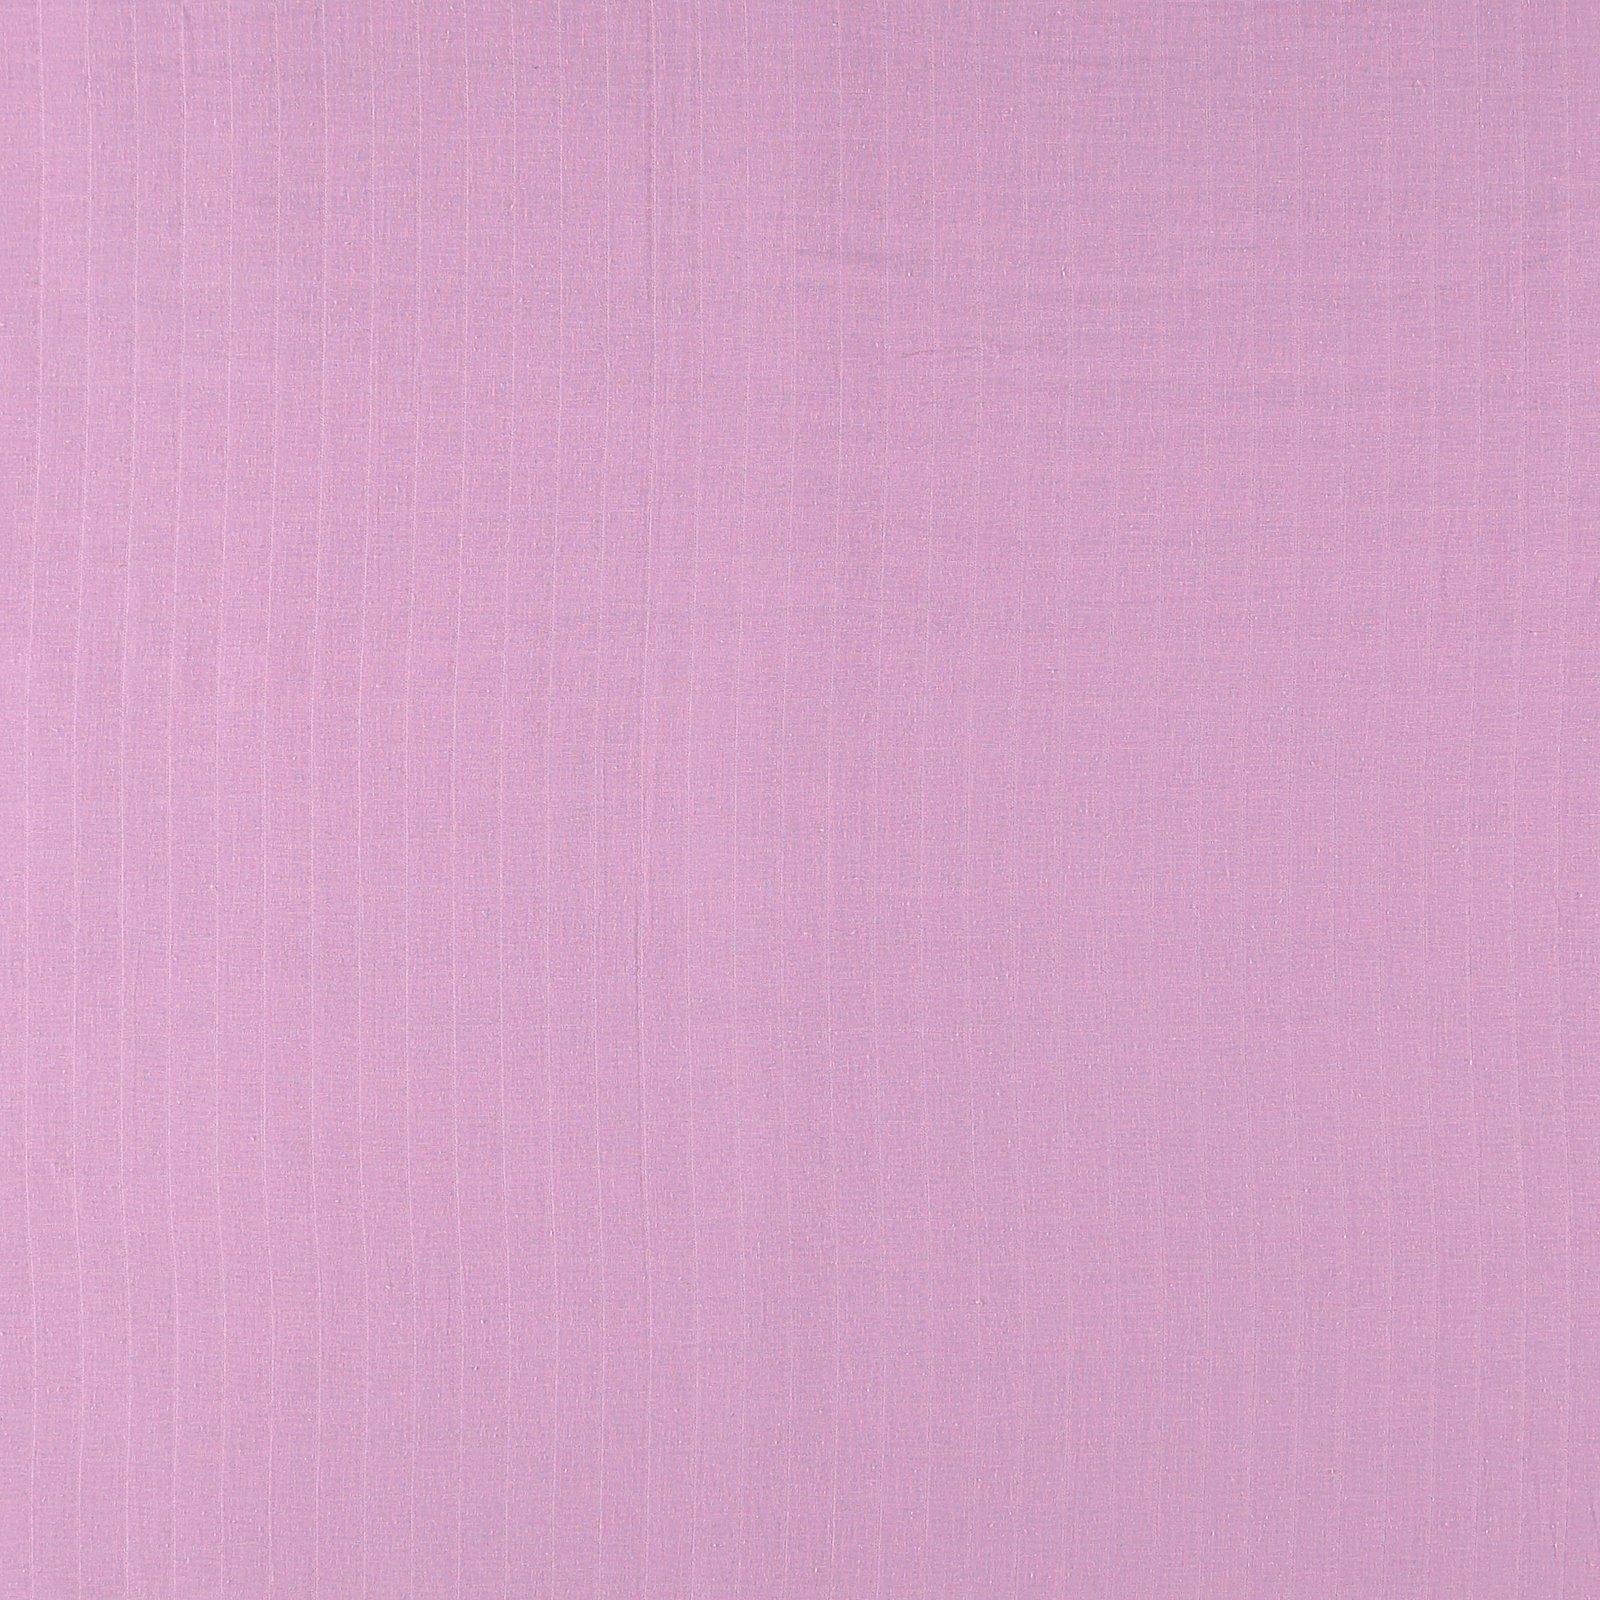 Muslin bright lavender 501825_pack_sp